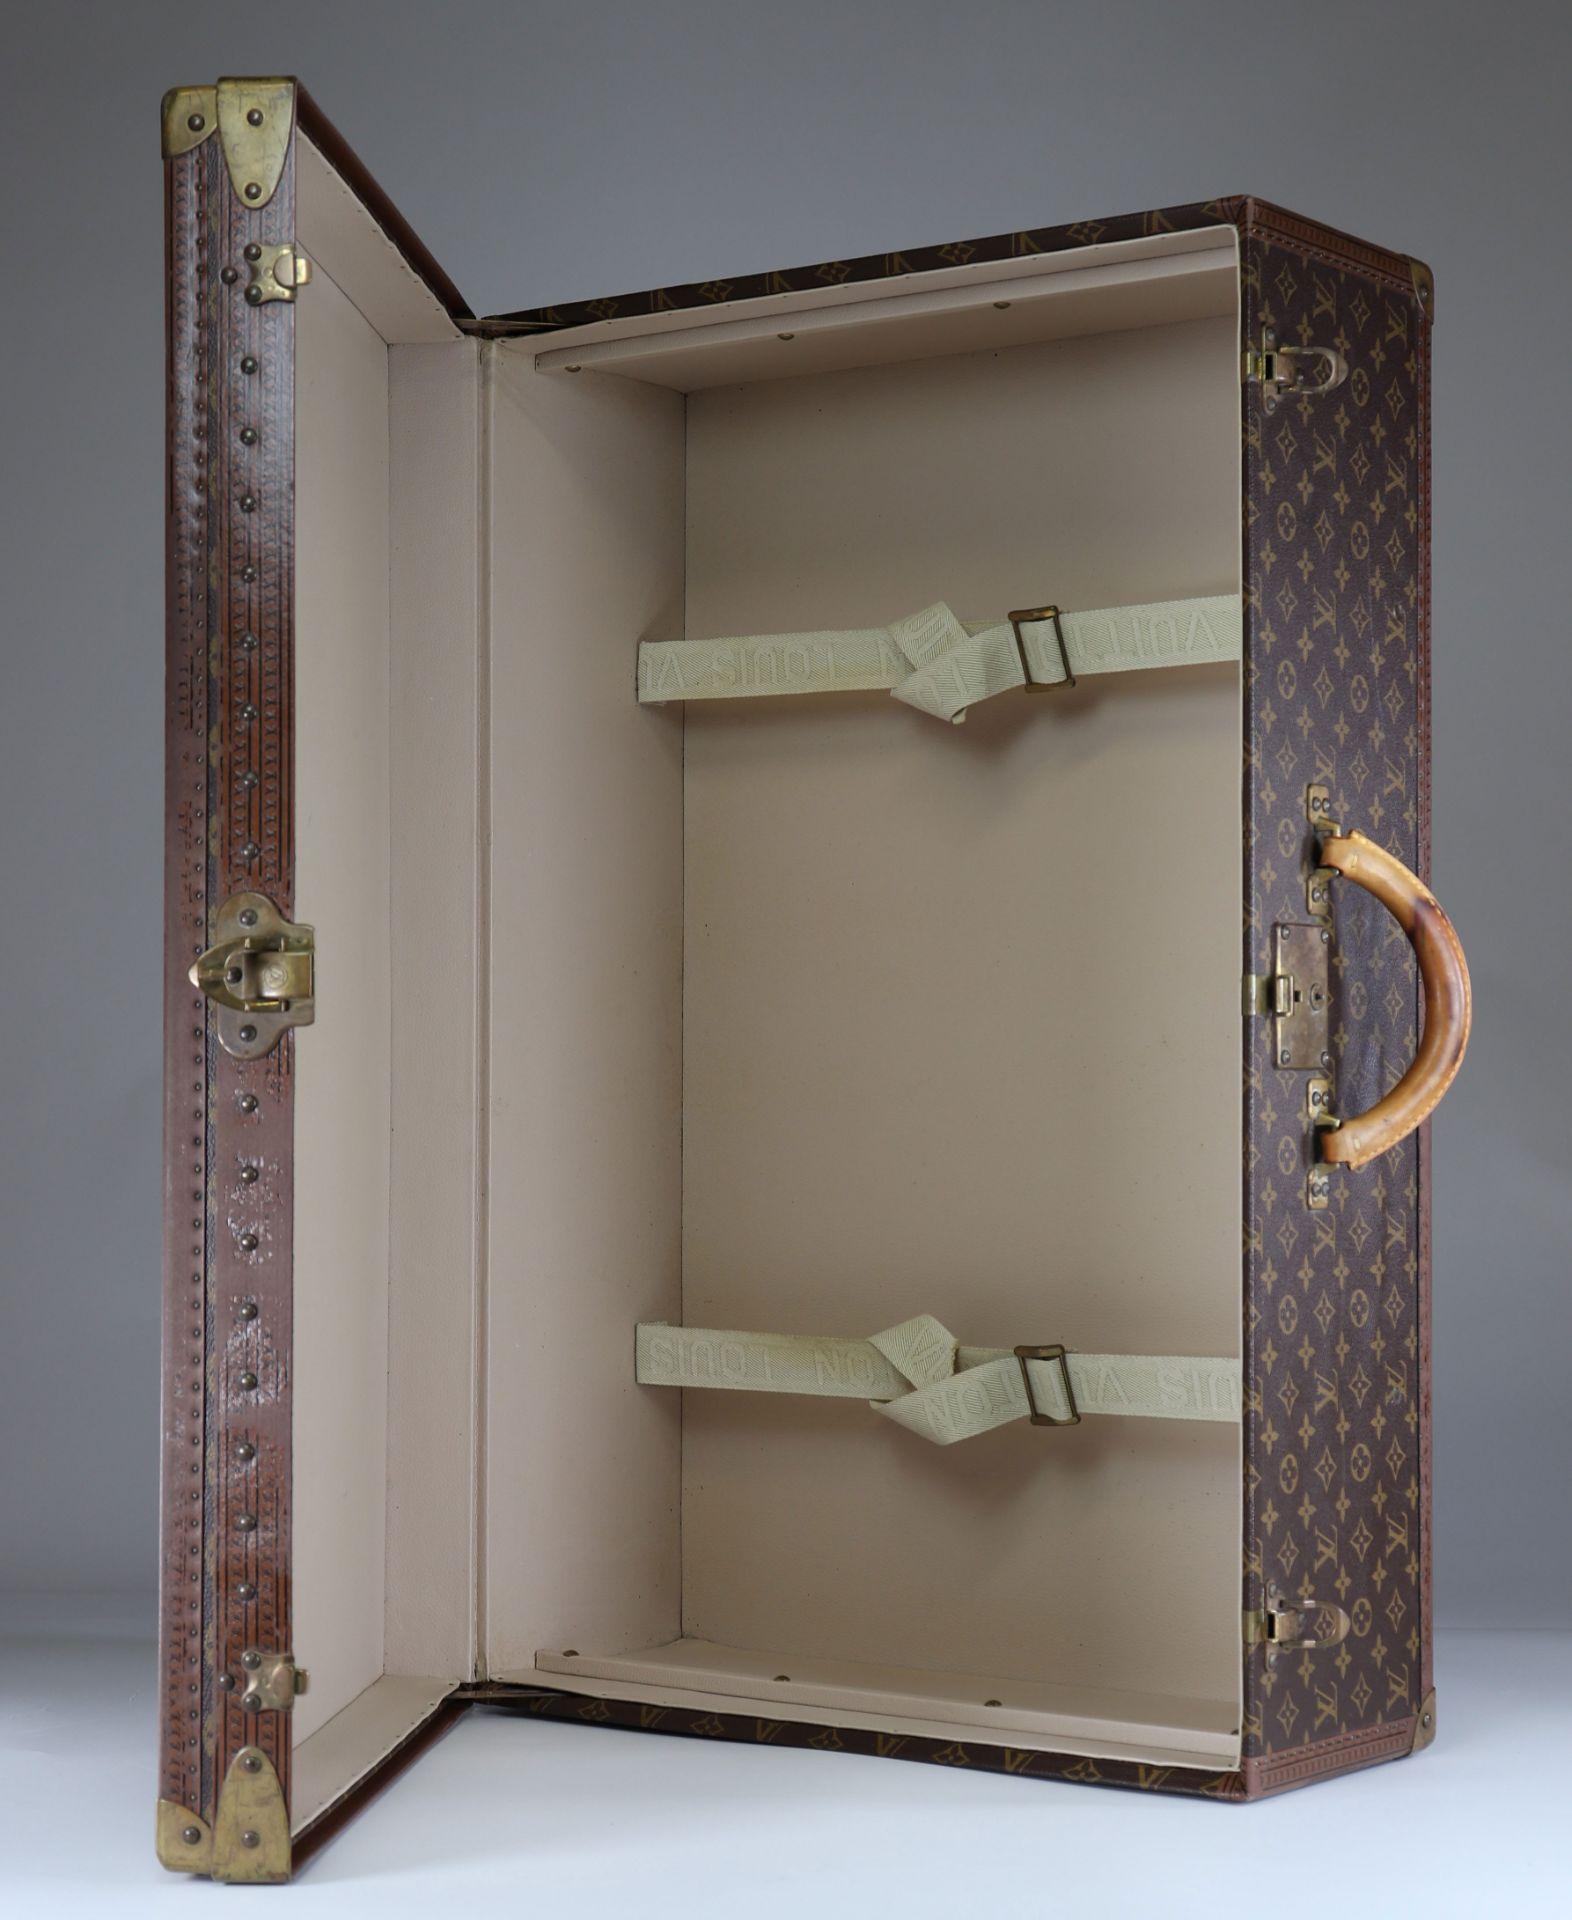 Louis Vuitton suitcase - Image 3 of 5